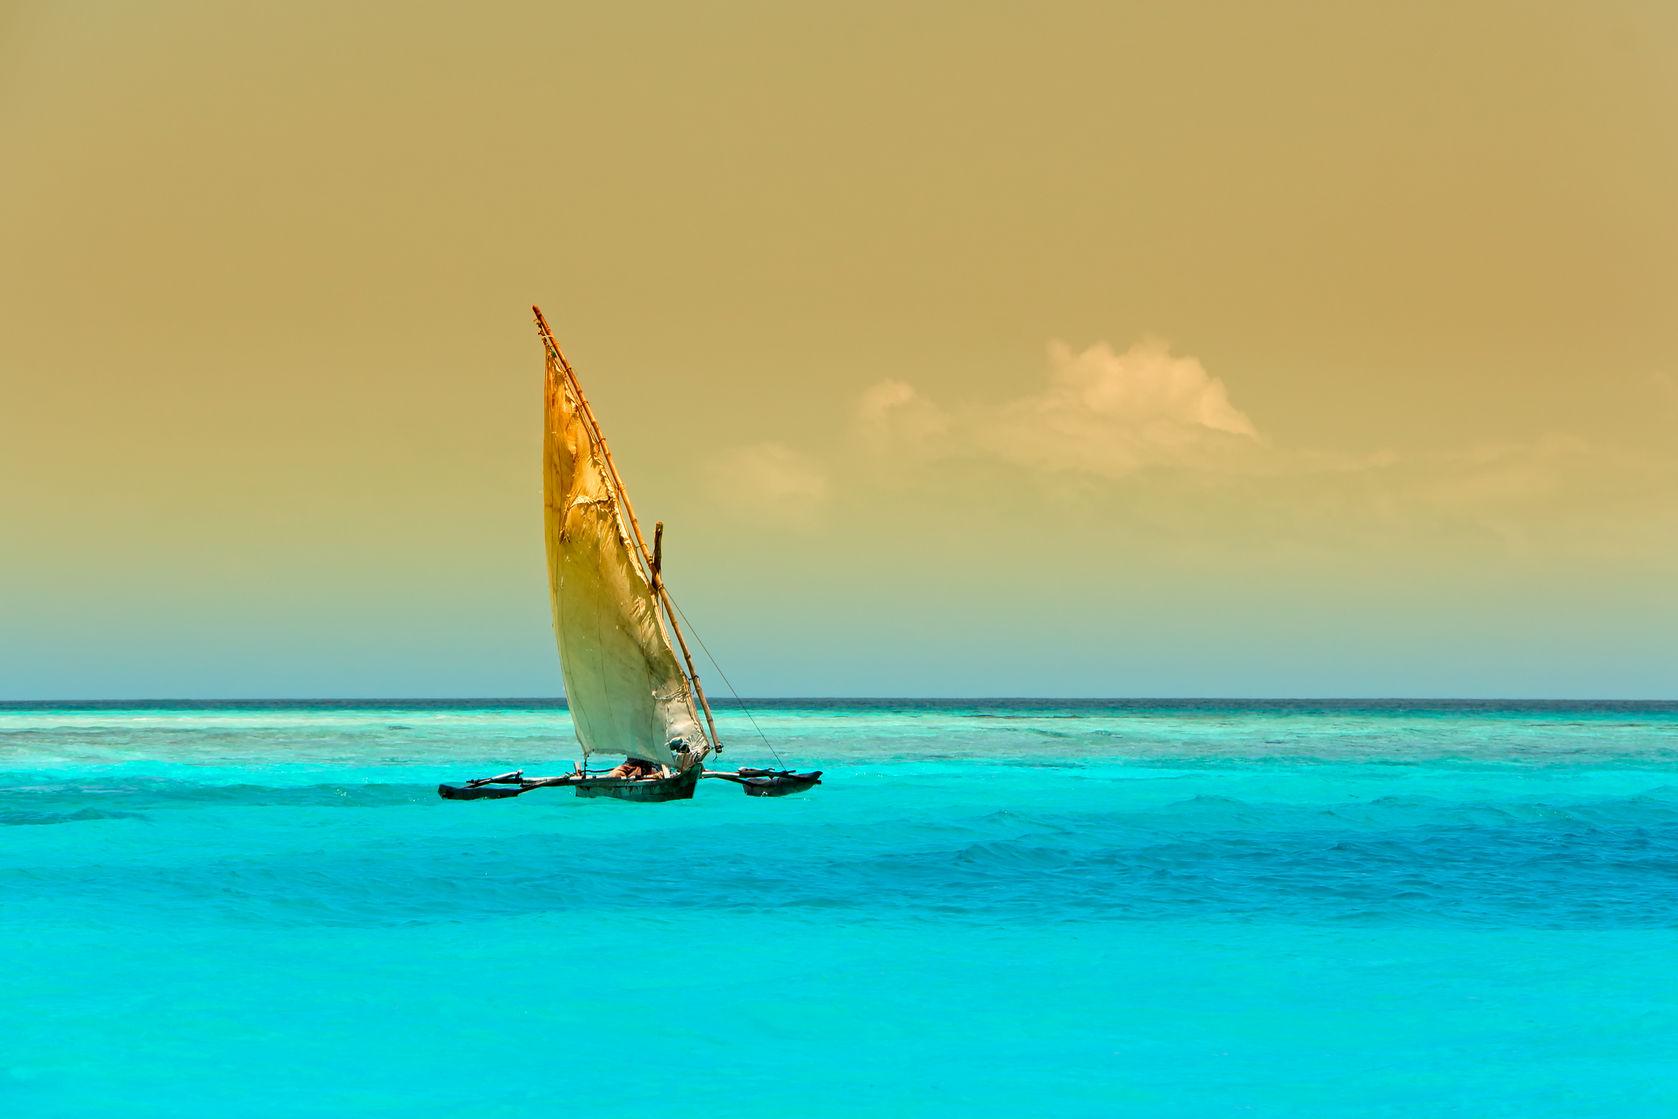 Where your ideas set sail